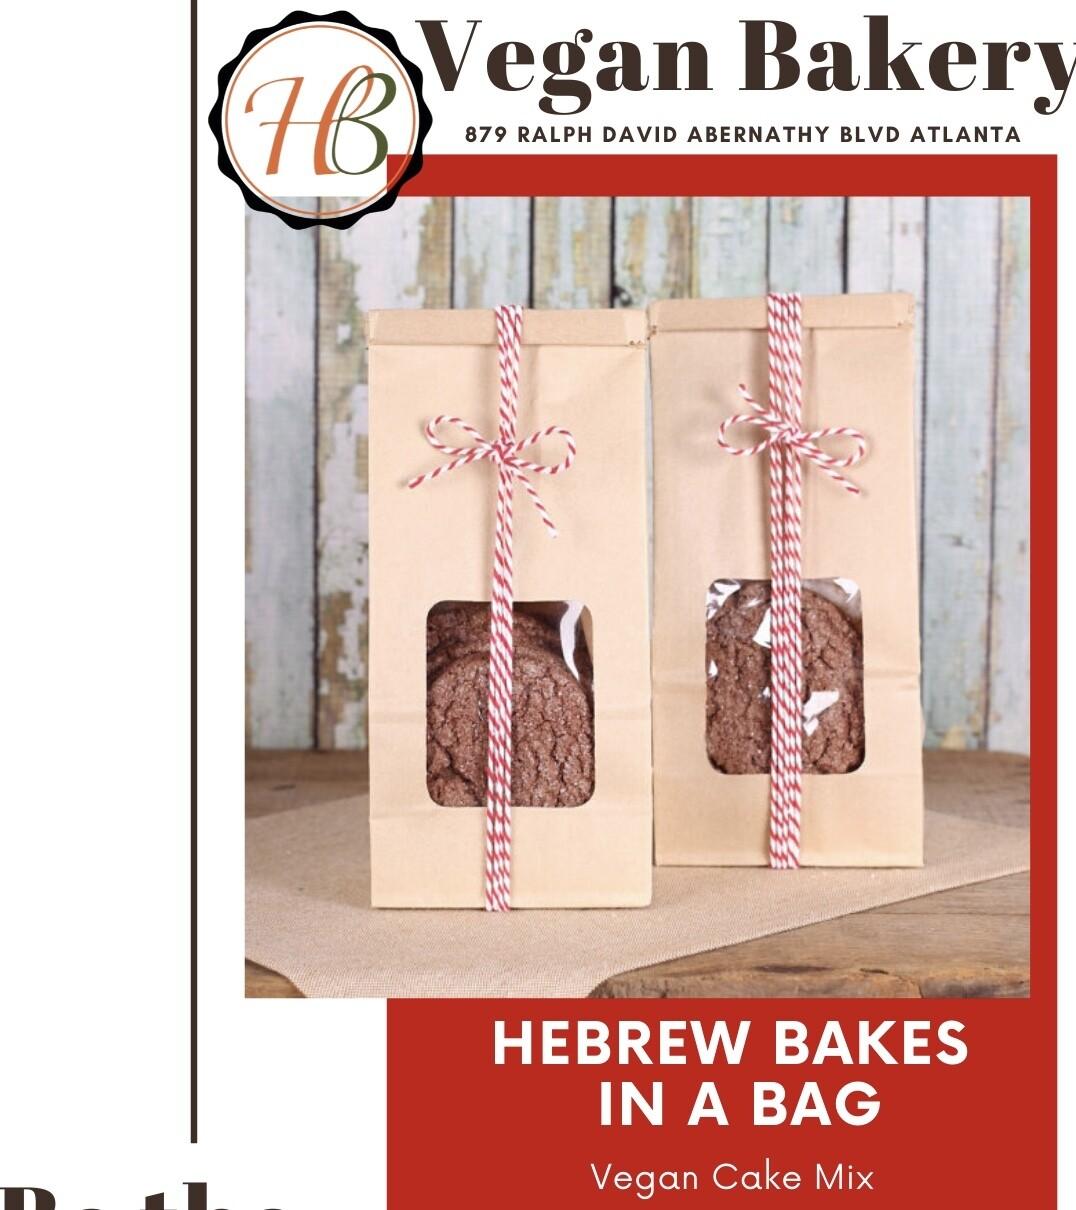 Hebrew Bakes in a Bag